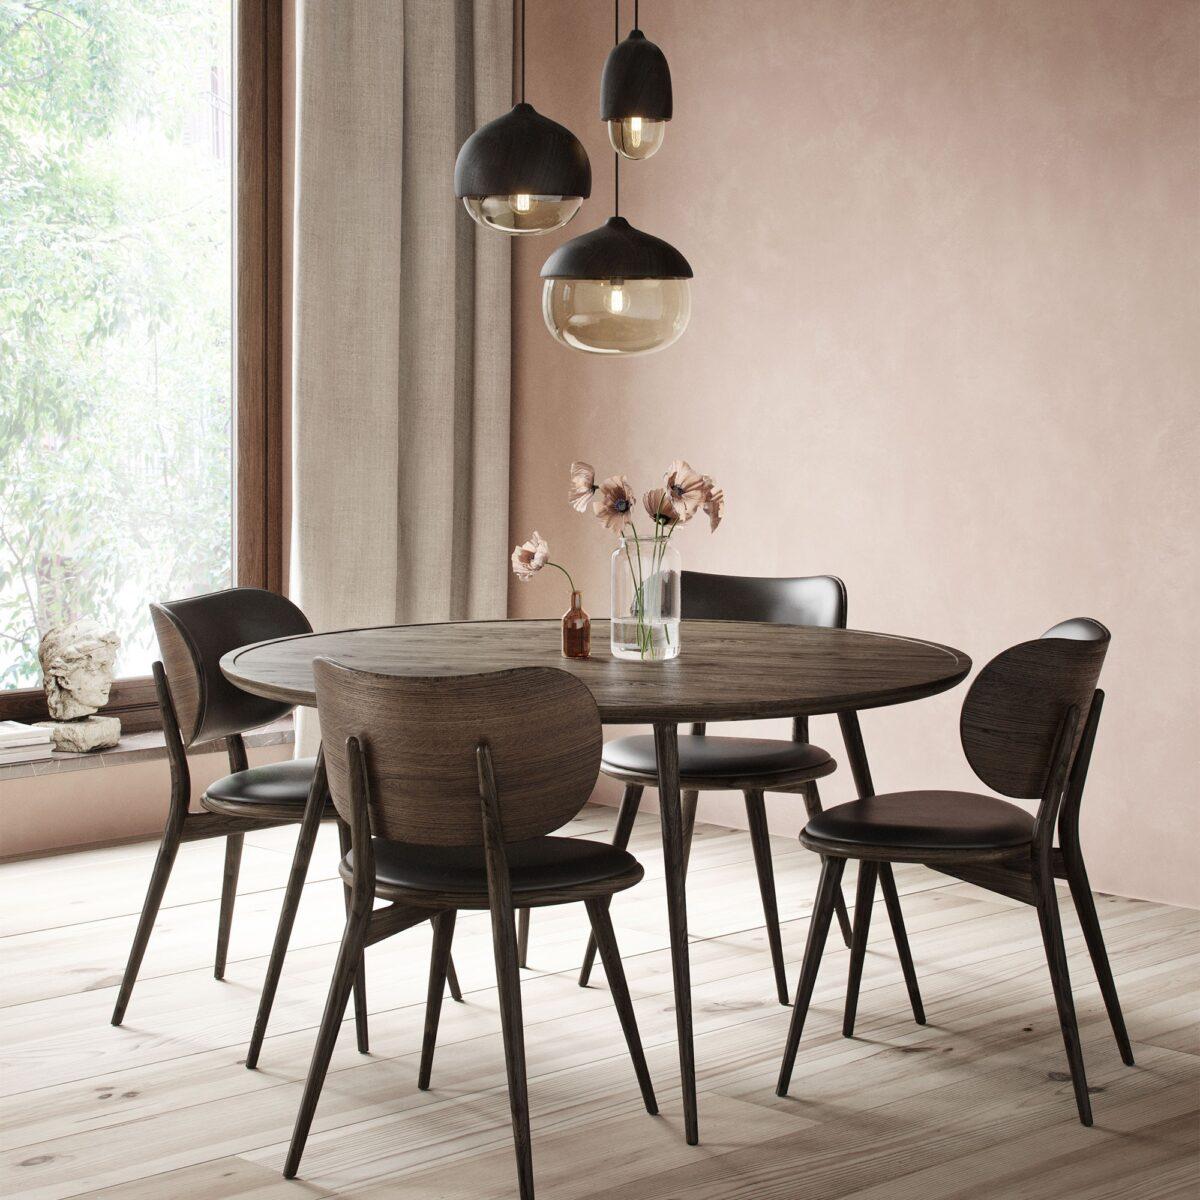 sedia-vintage-legno-e-pelle-nera